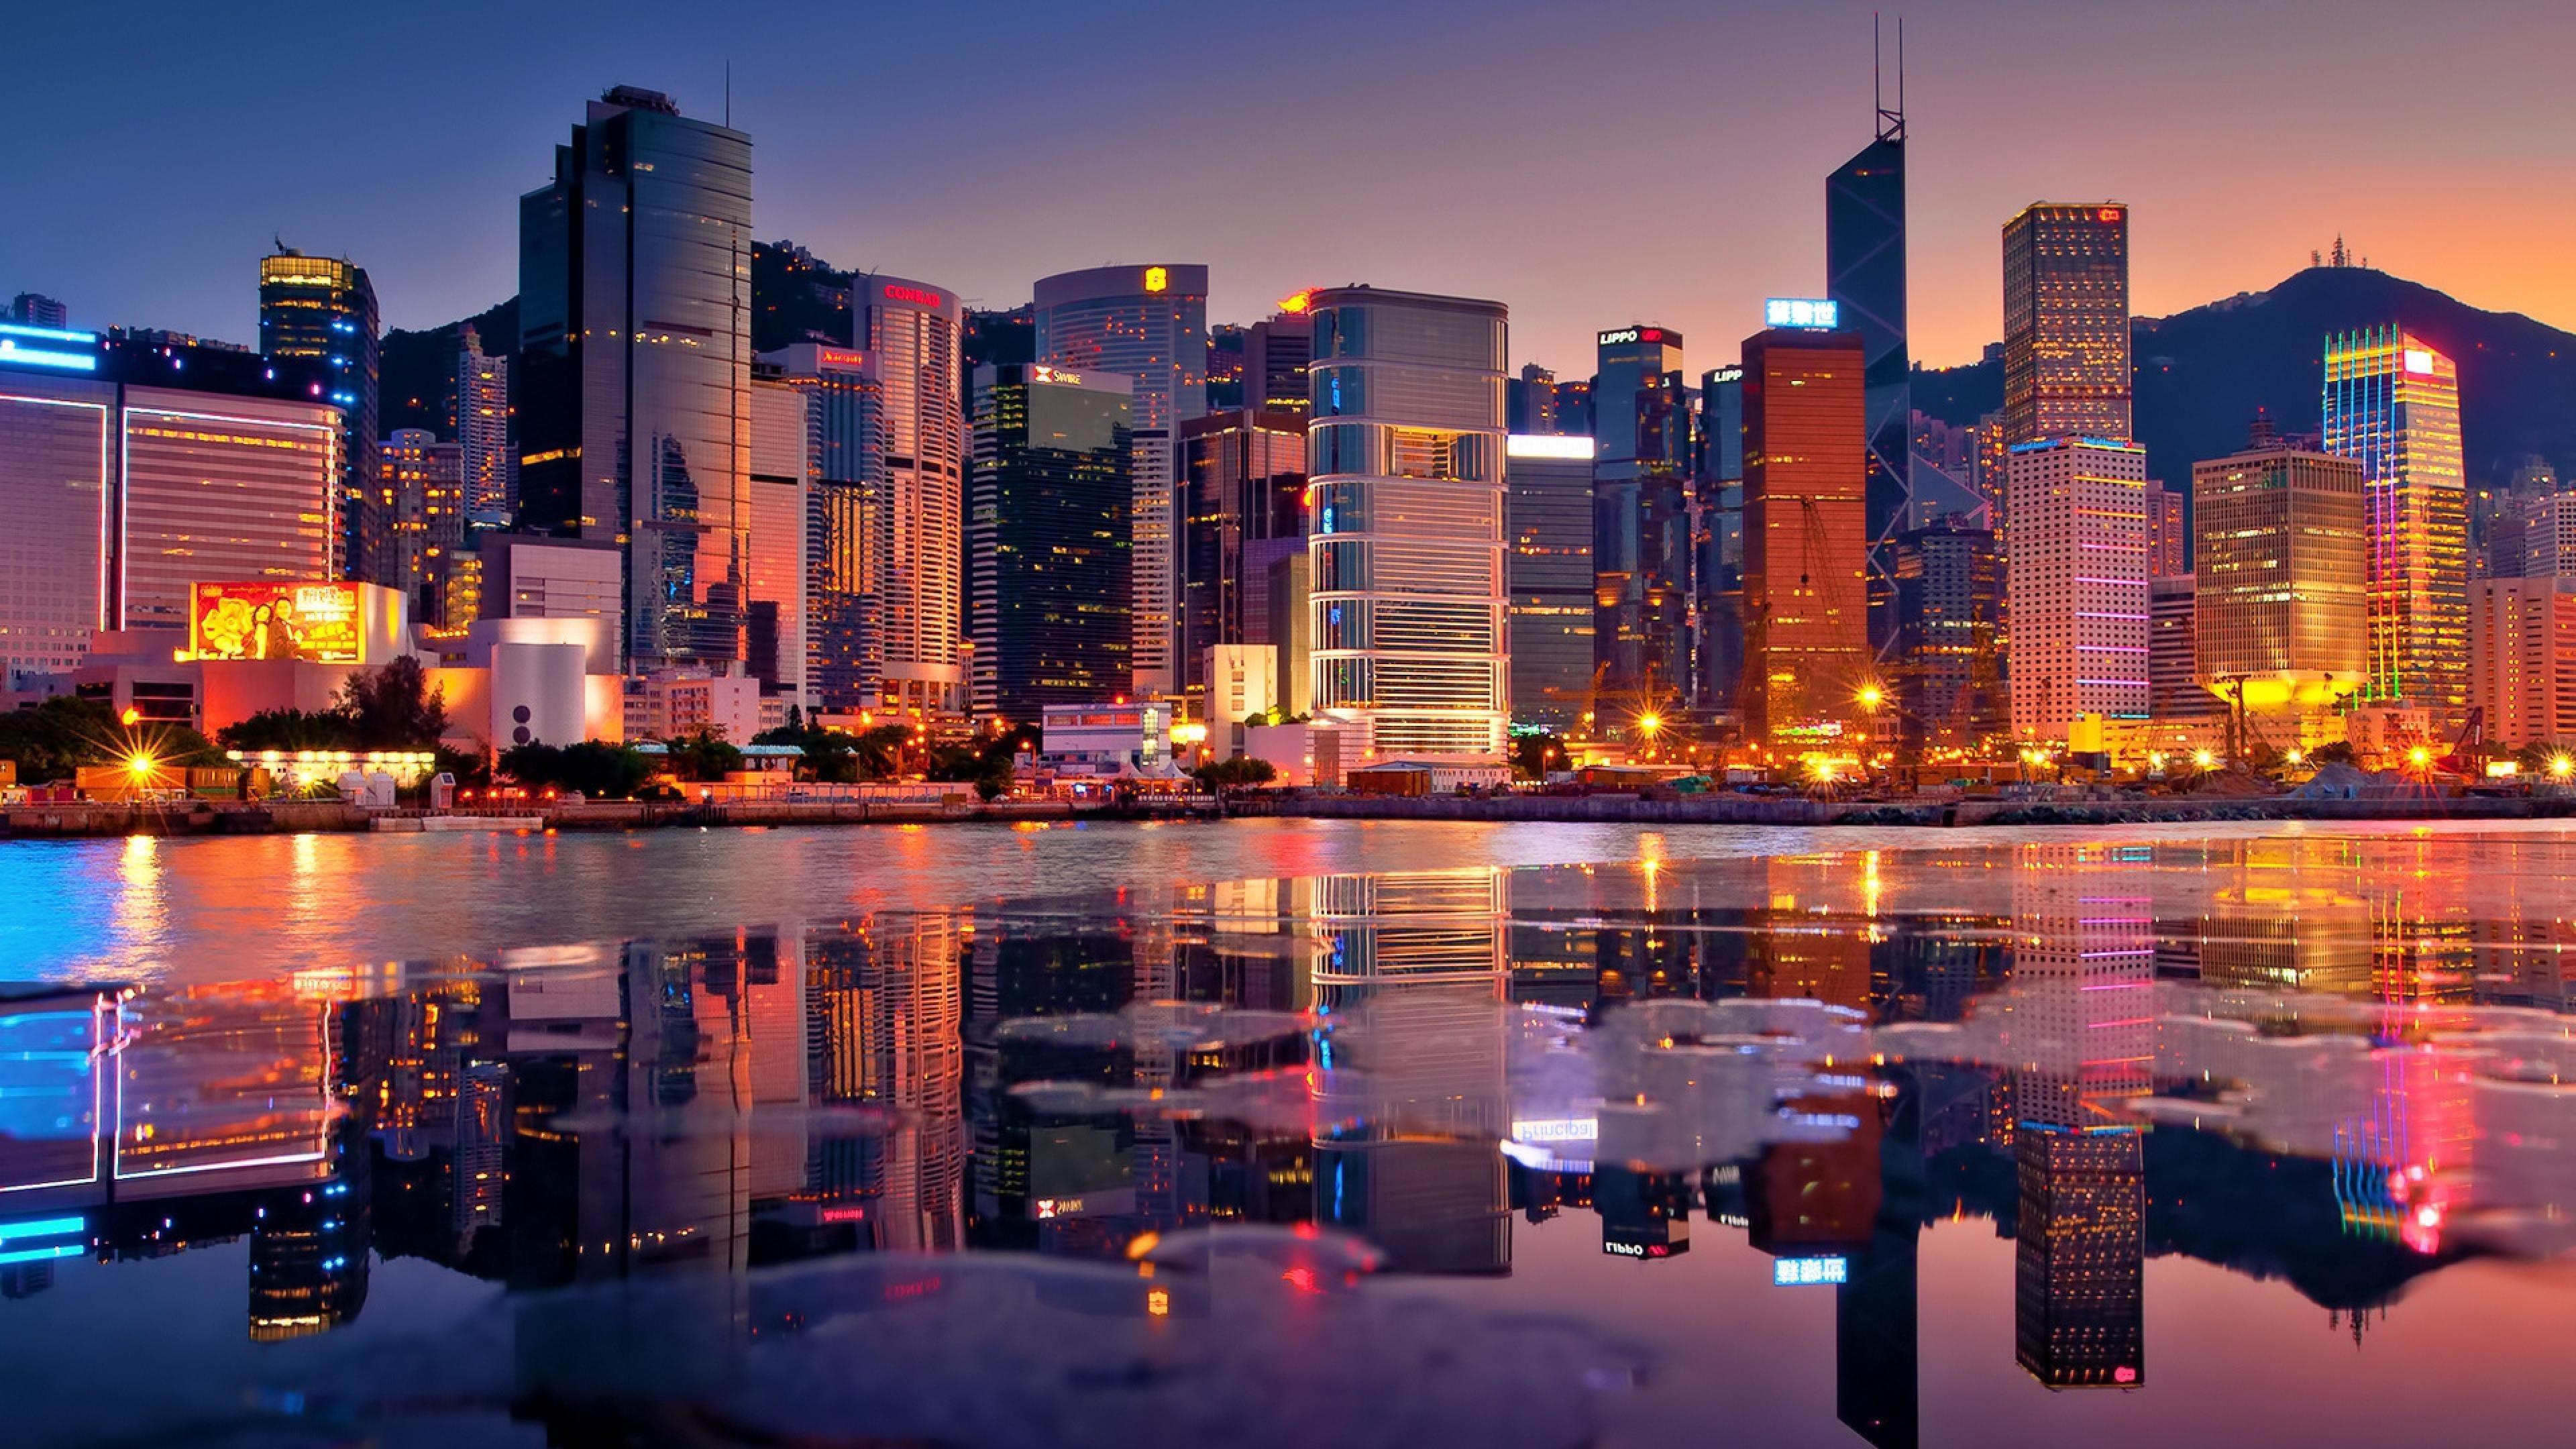 Skycrappers Hong Kong 4k Hd World 4k Wallpapers Images